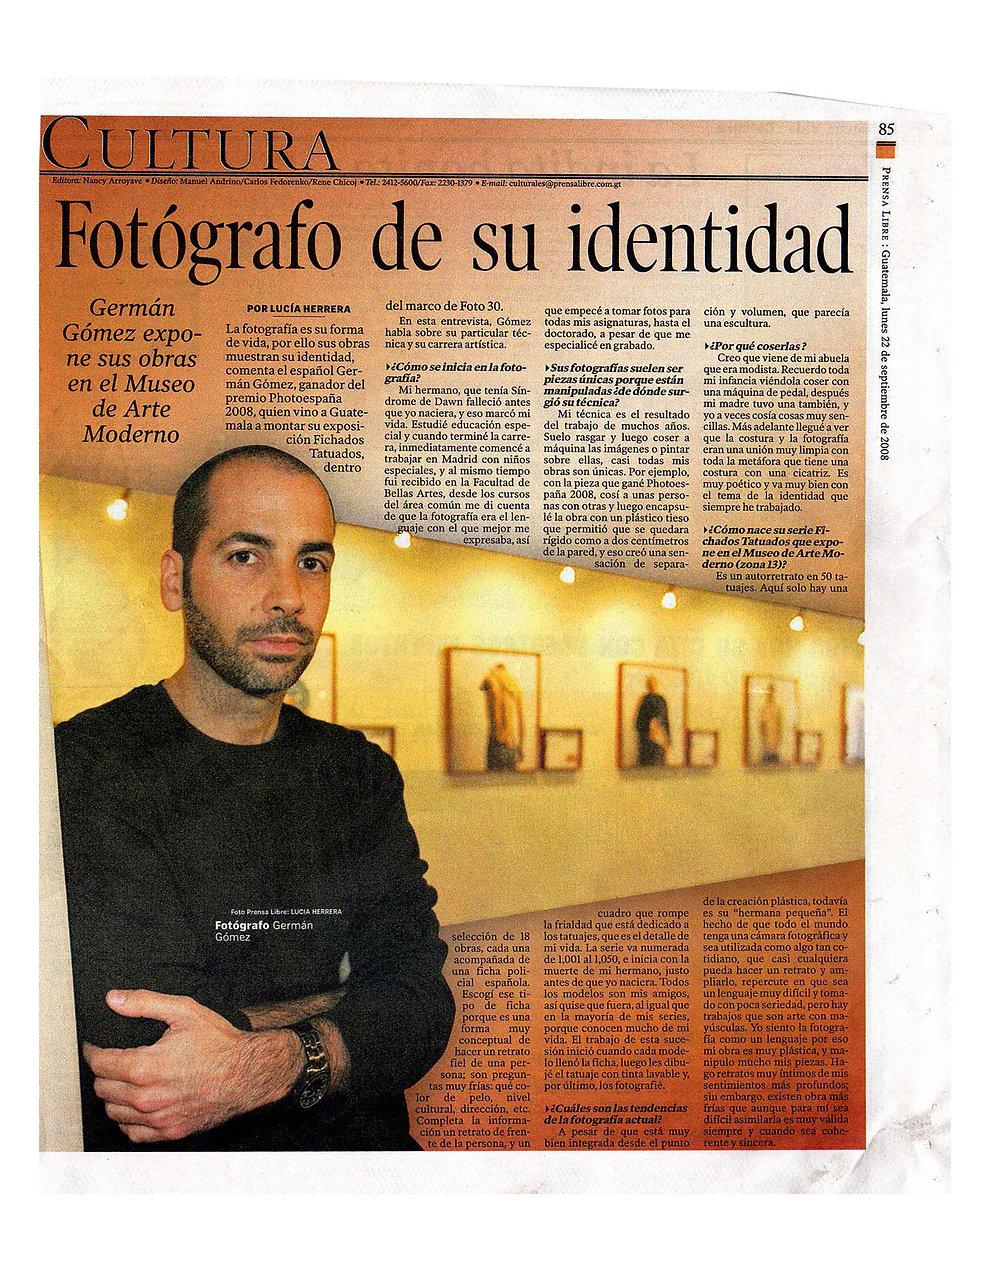 2008_09 Prensa Libre Guatemala.jpg